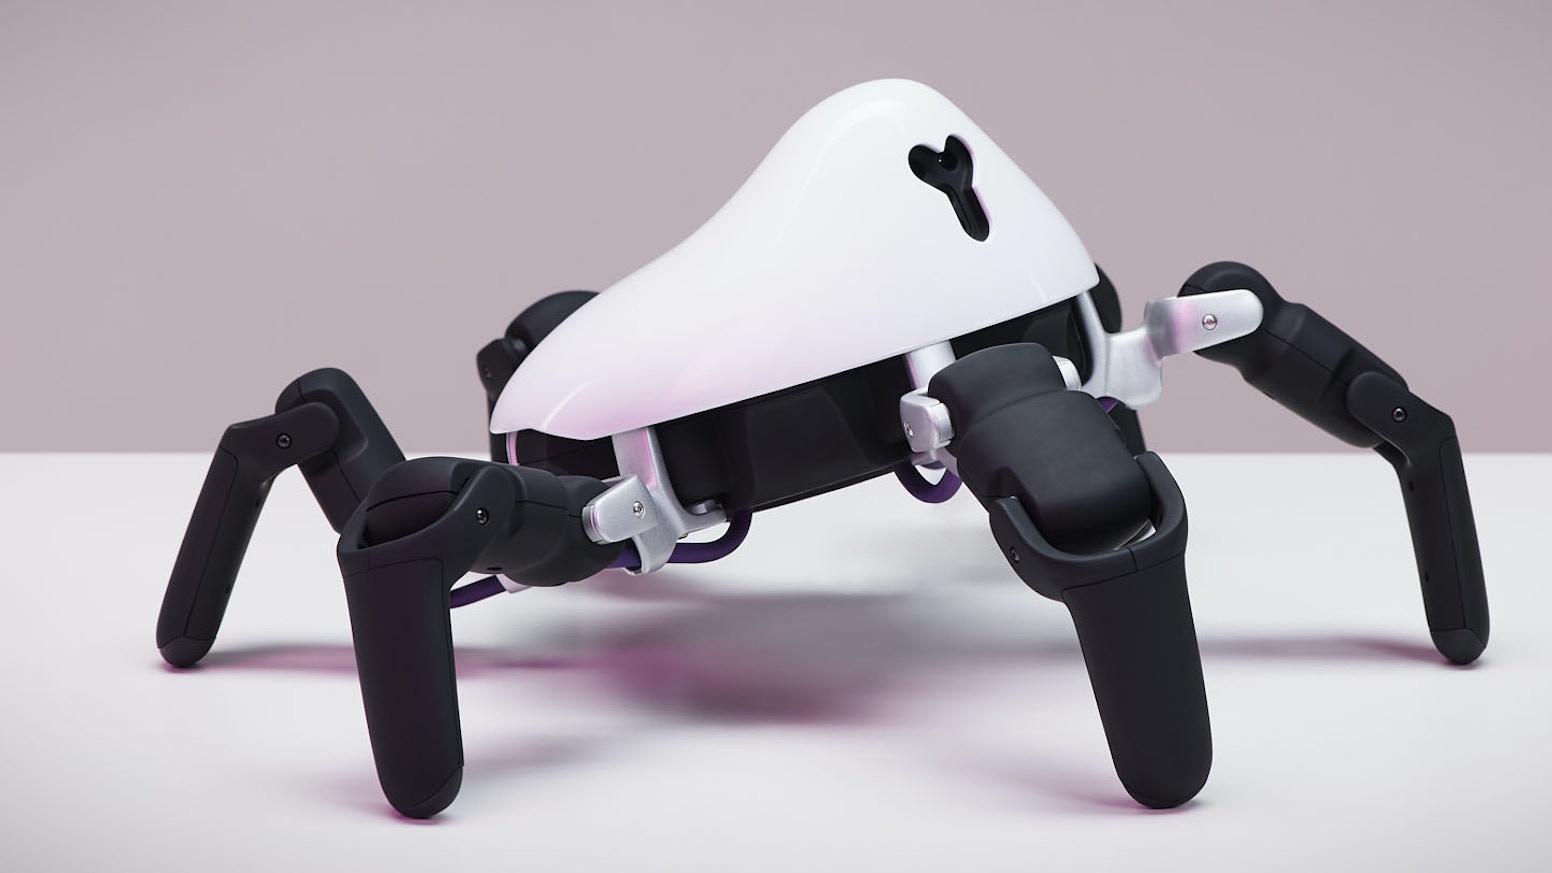 Available today: https://www.vincross.com/hexa . Robot + Robotic SDK. Make something cool. Conquer big problems. Enter the era of robotics.